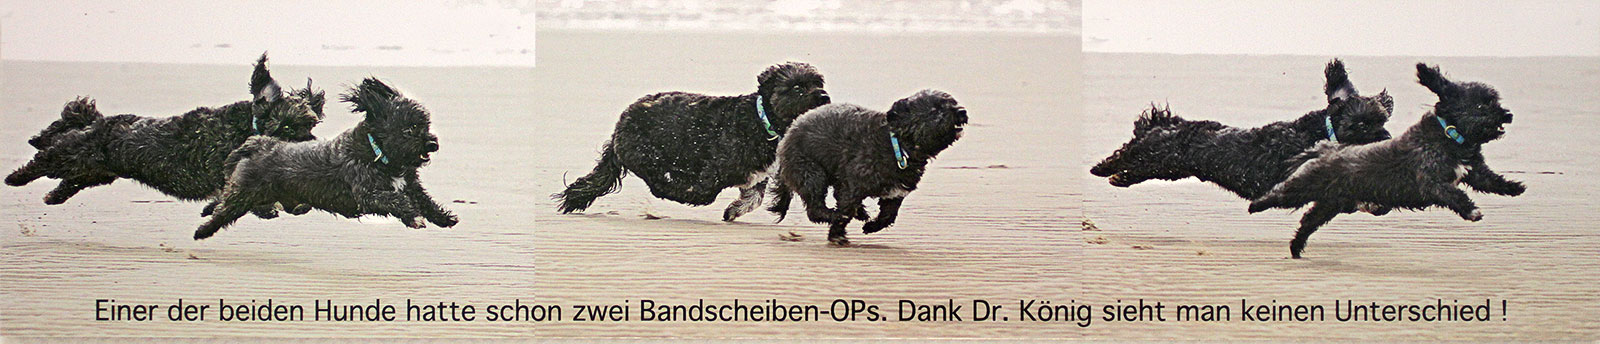 Hunde ohne Beschwerden Dank guter Tier-Neurochirurgie